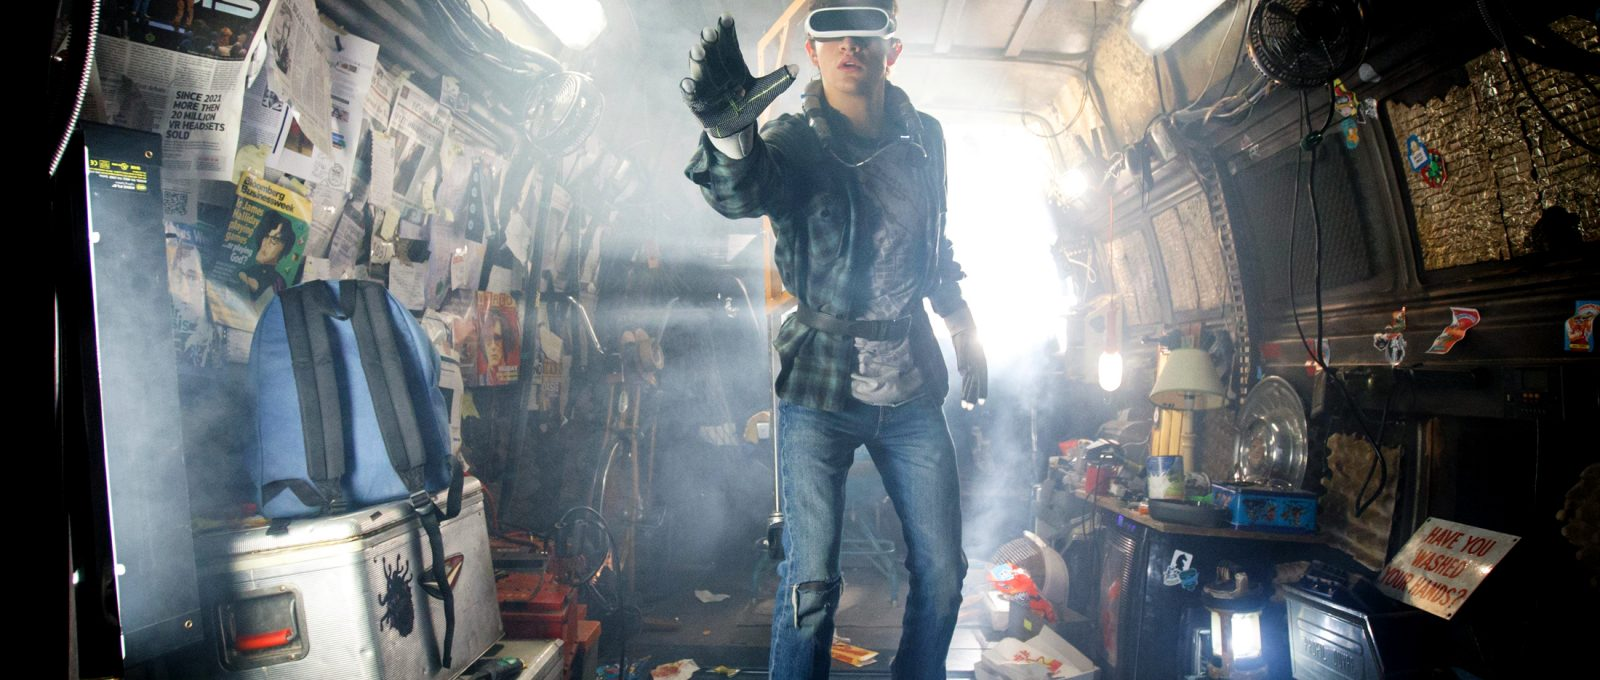 Ready Player One: Steven Spielberg's new movie trailer